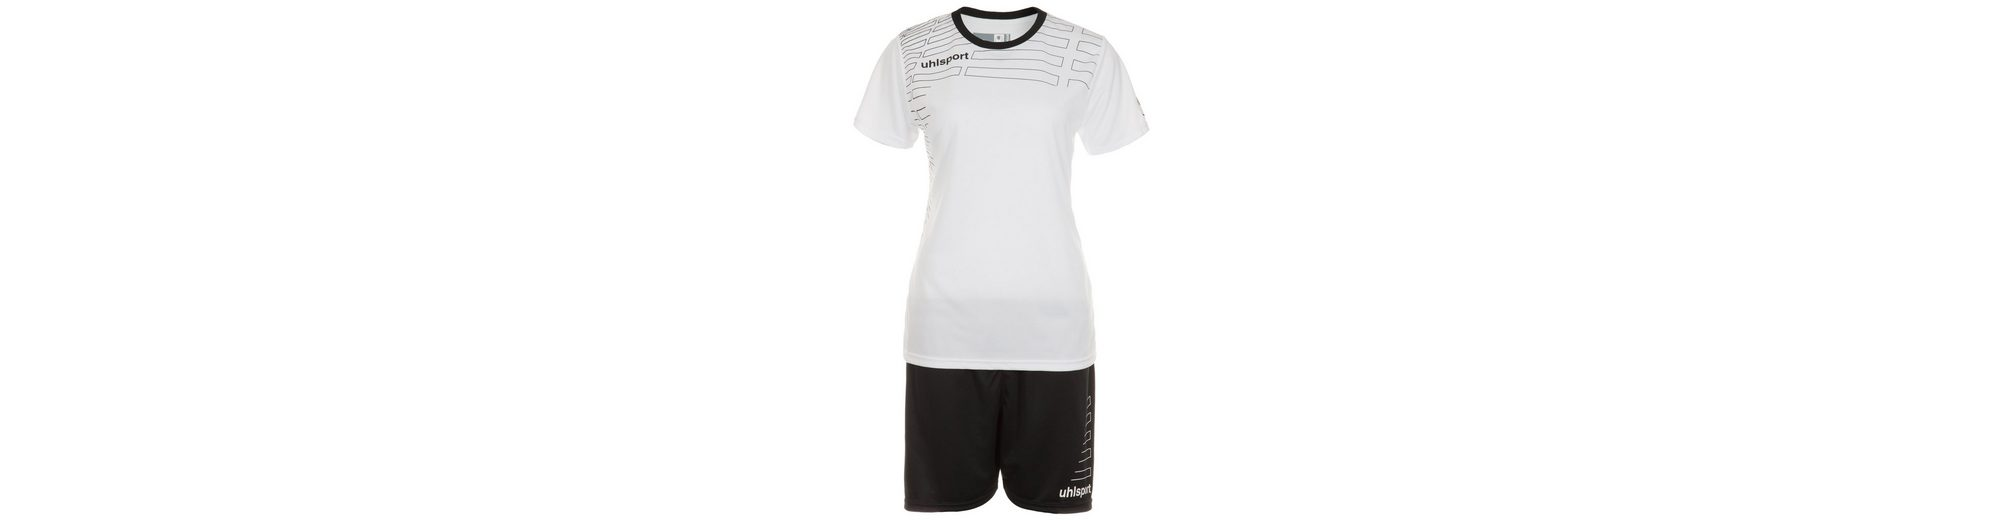 Händler Online Steckdose Am Besten UHLSPORT Match Team Kit Shortsleeve Damen Factory-Outlet-Verkauf Online 100% Ig Garantiert Günstig Online 91szMX6w